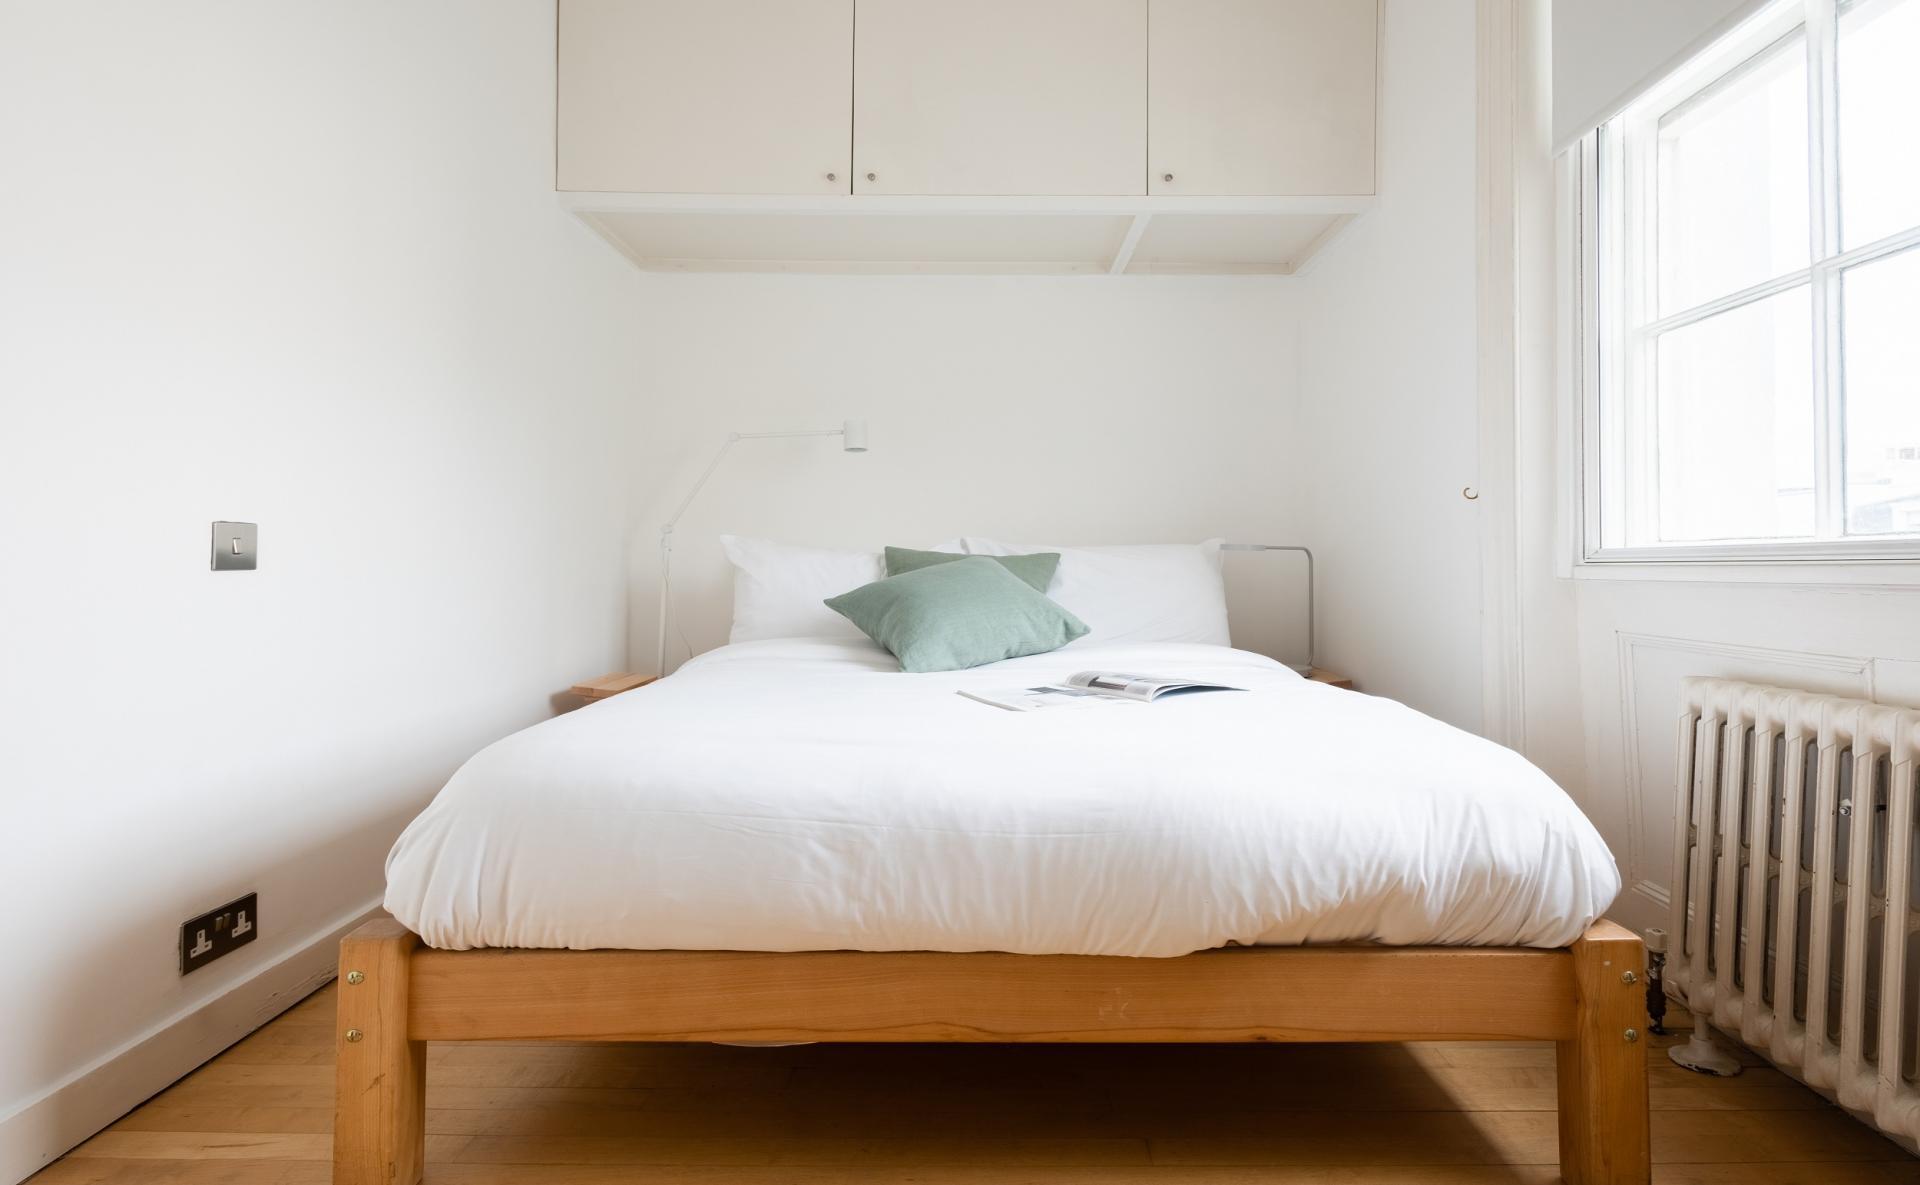 Double bed at The Holland Park Escape, Holland Park, London